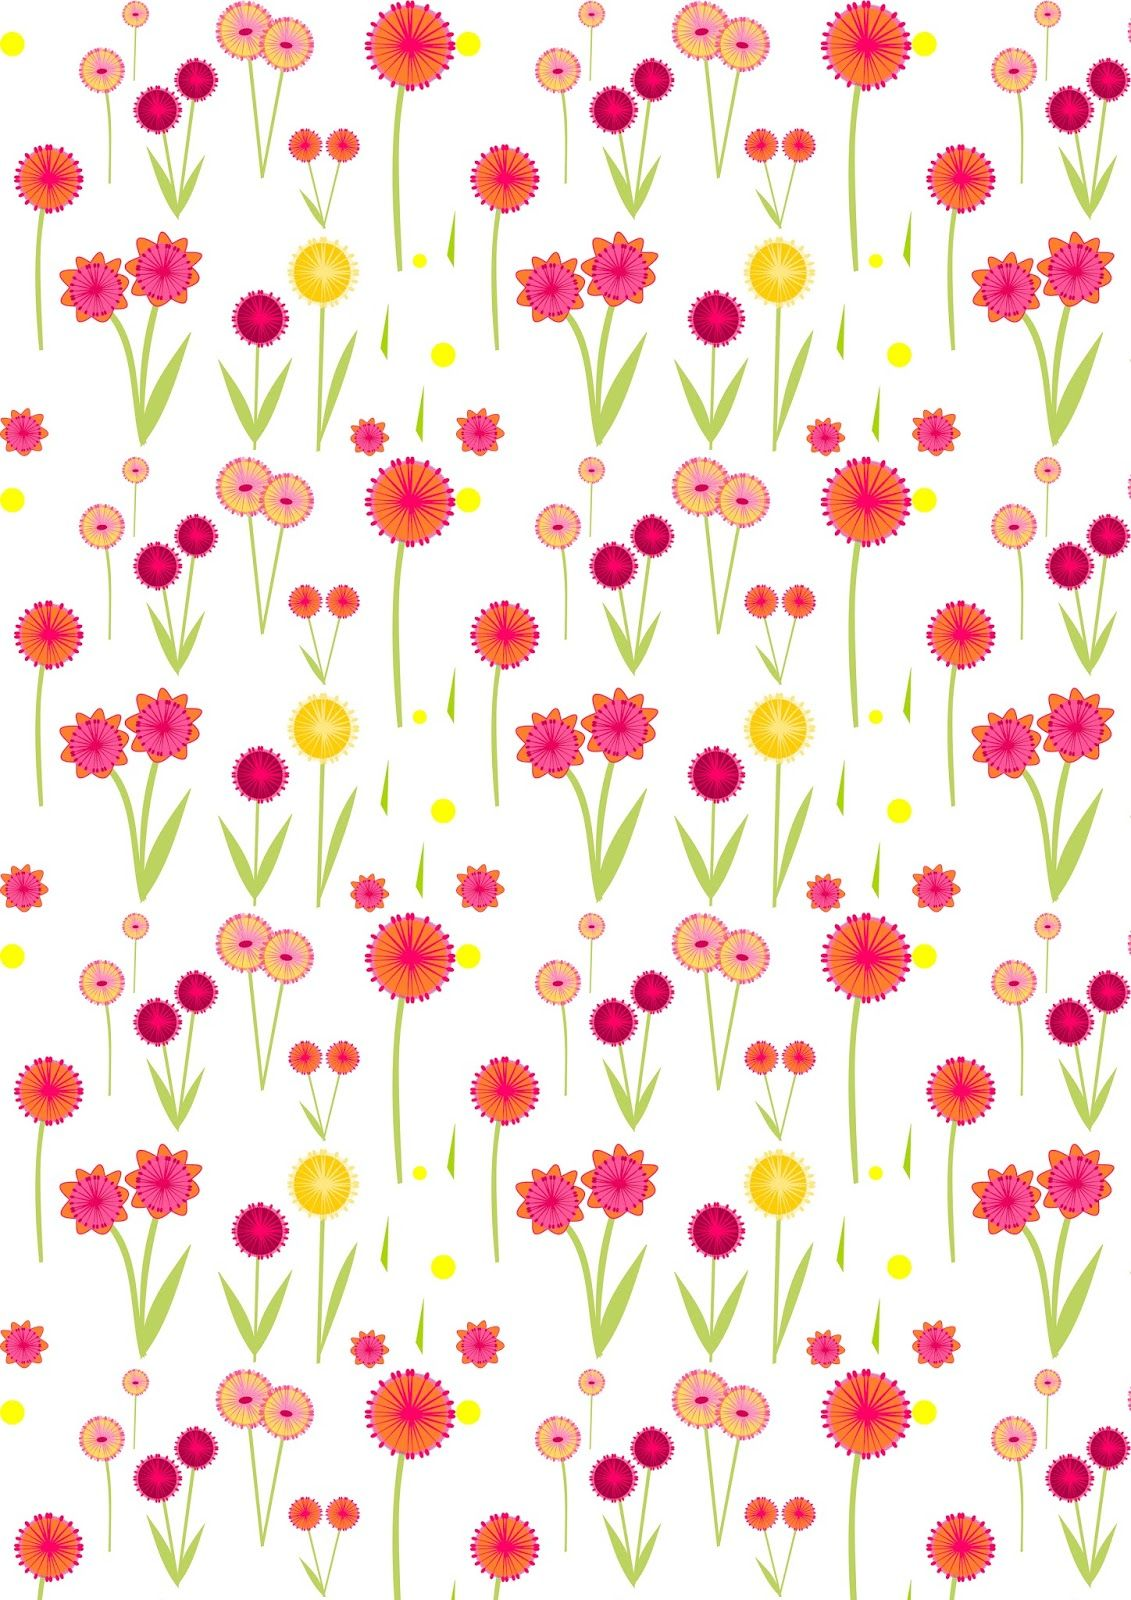 Free Digital Flower Scrapbooking Paper Ausdruckbares